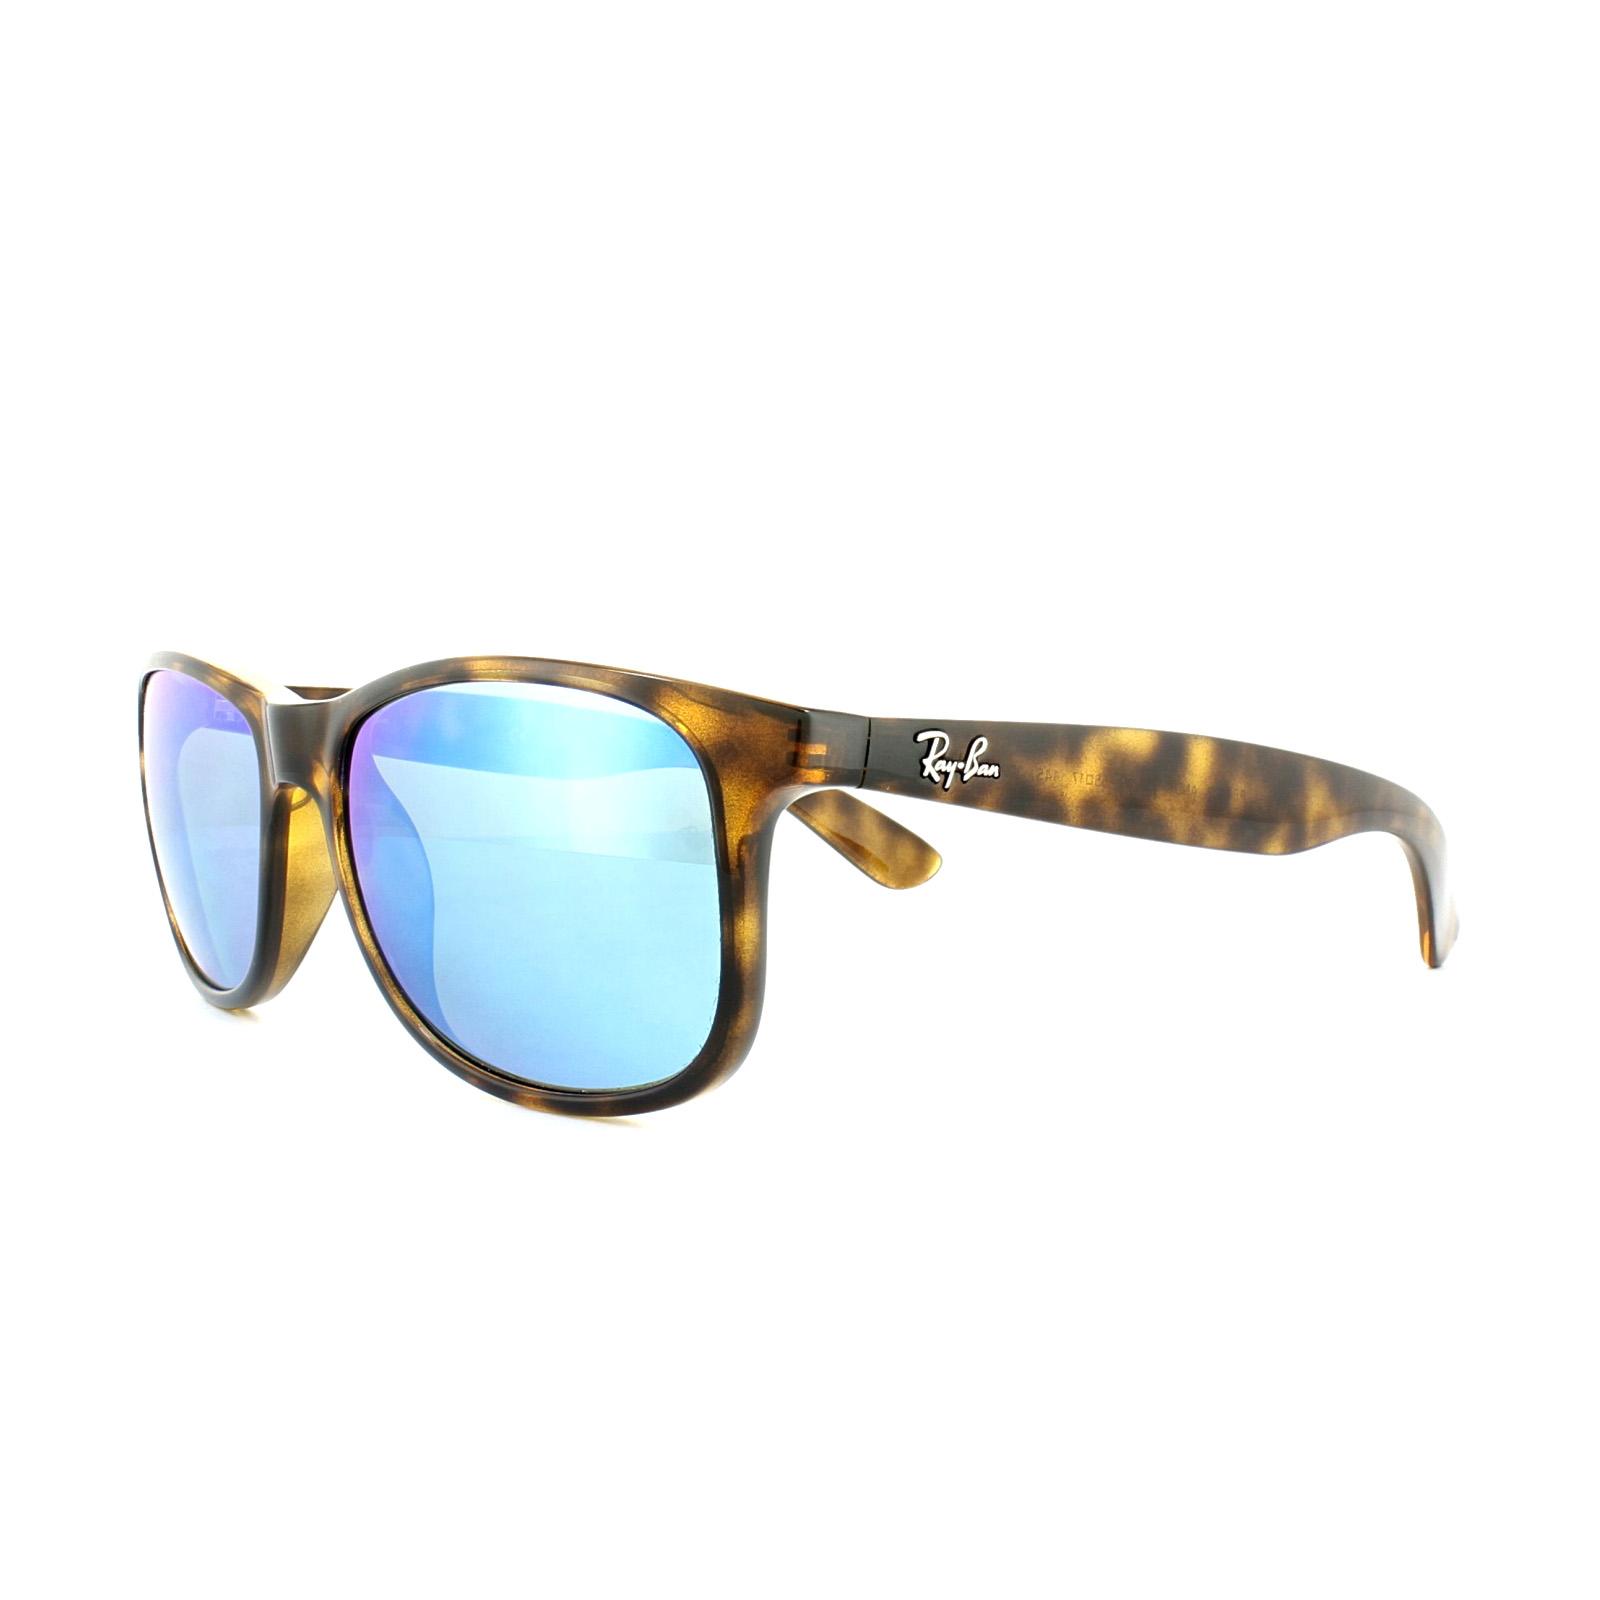 bc201de5bf Sentinel Rayban Sunglasses Andy 4202 710 9R Shiny Havana Blue Mirror  Polarized